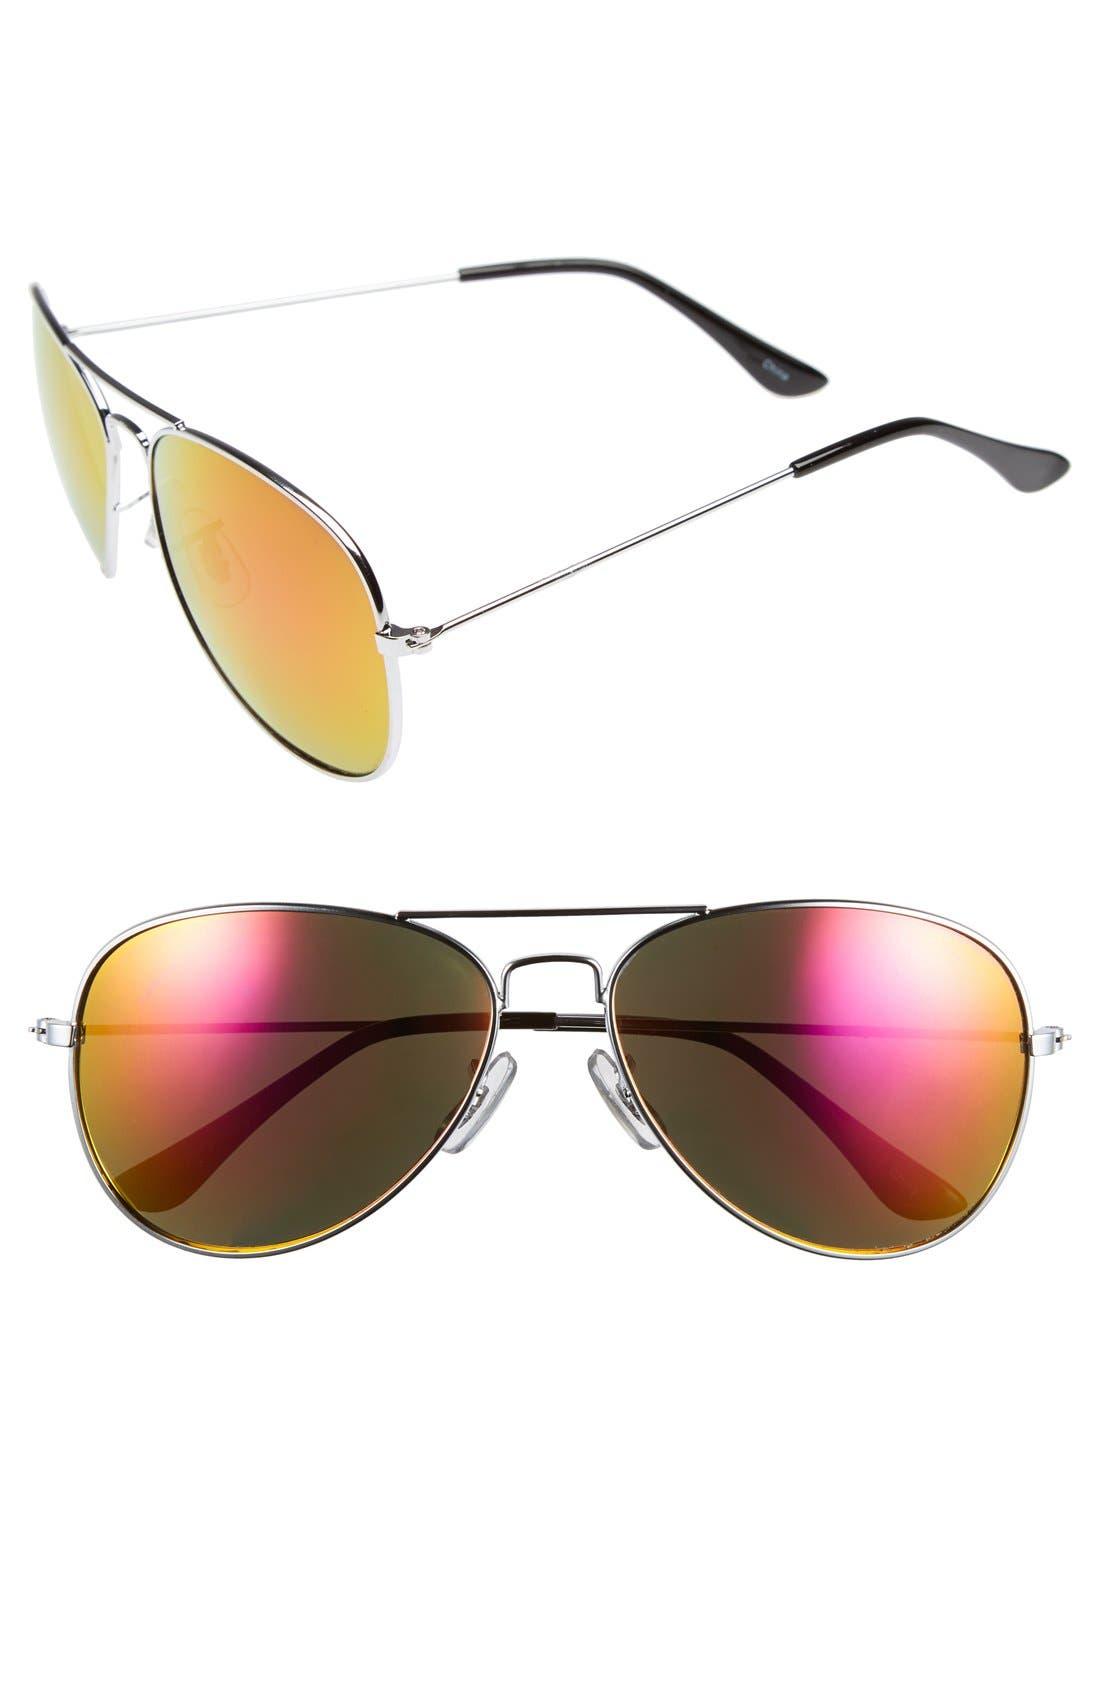 55mm Mirrored Aviator Sunglasses,                         Main,                         color, 040